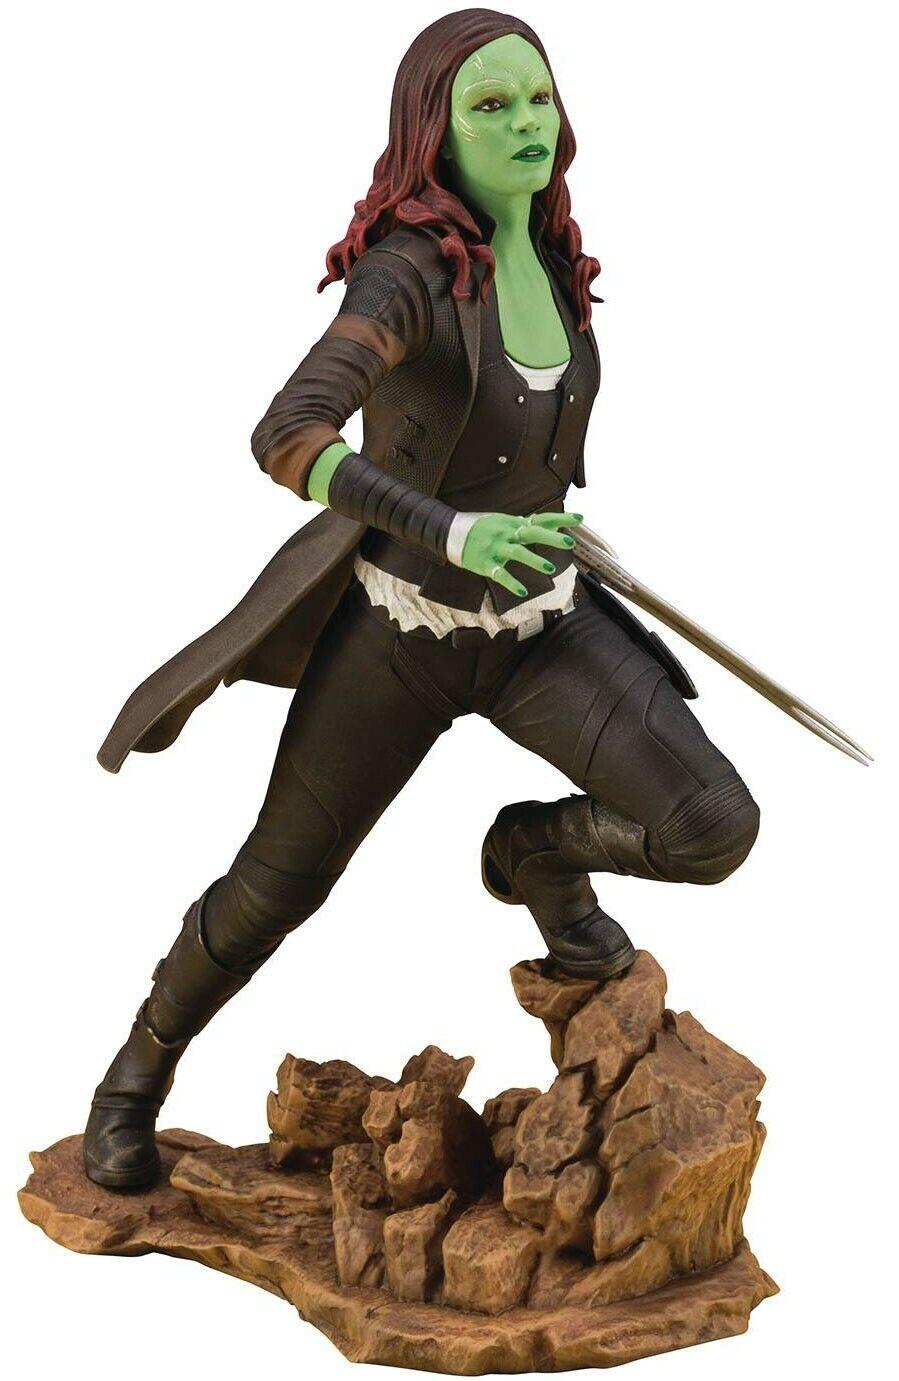 Marvel Vengadores Infinito Guerra ArtFX + Gamora Estatua